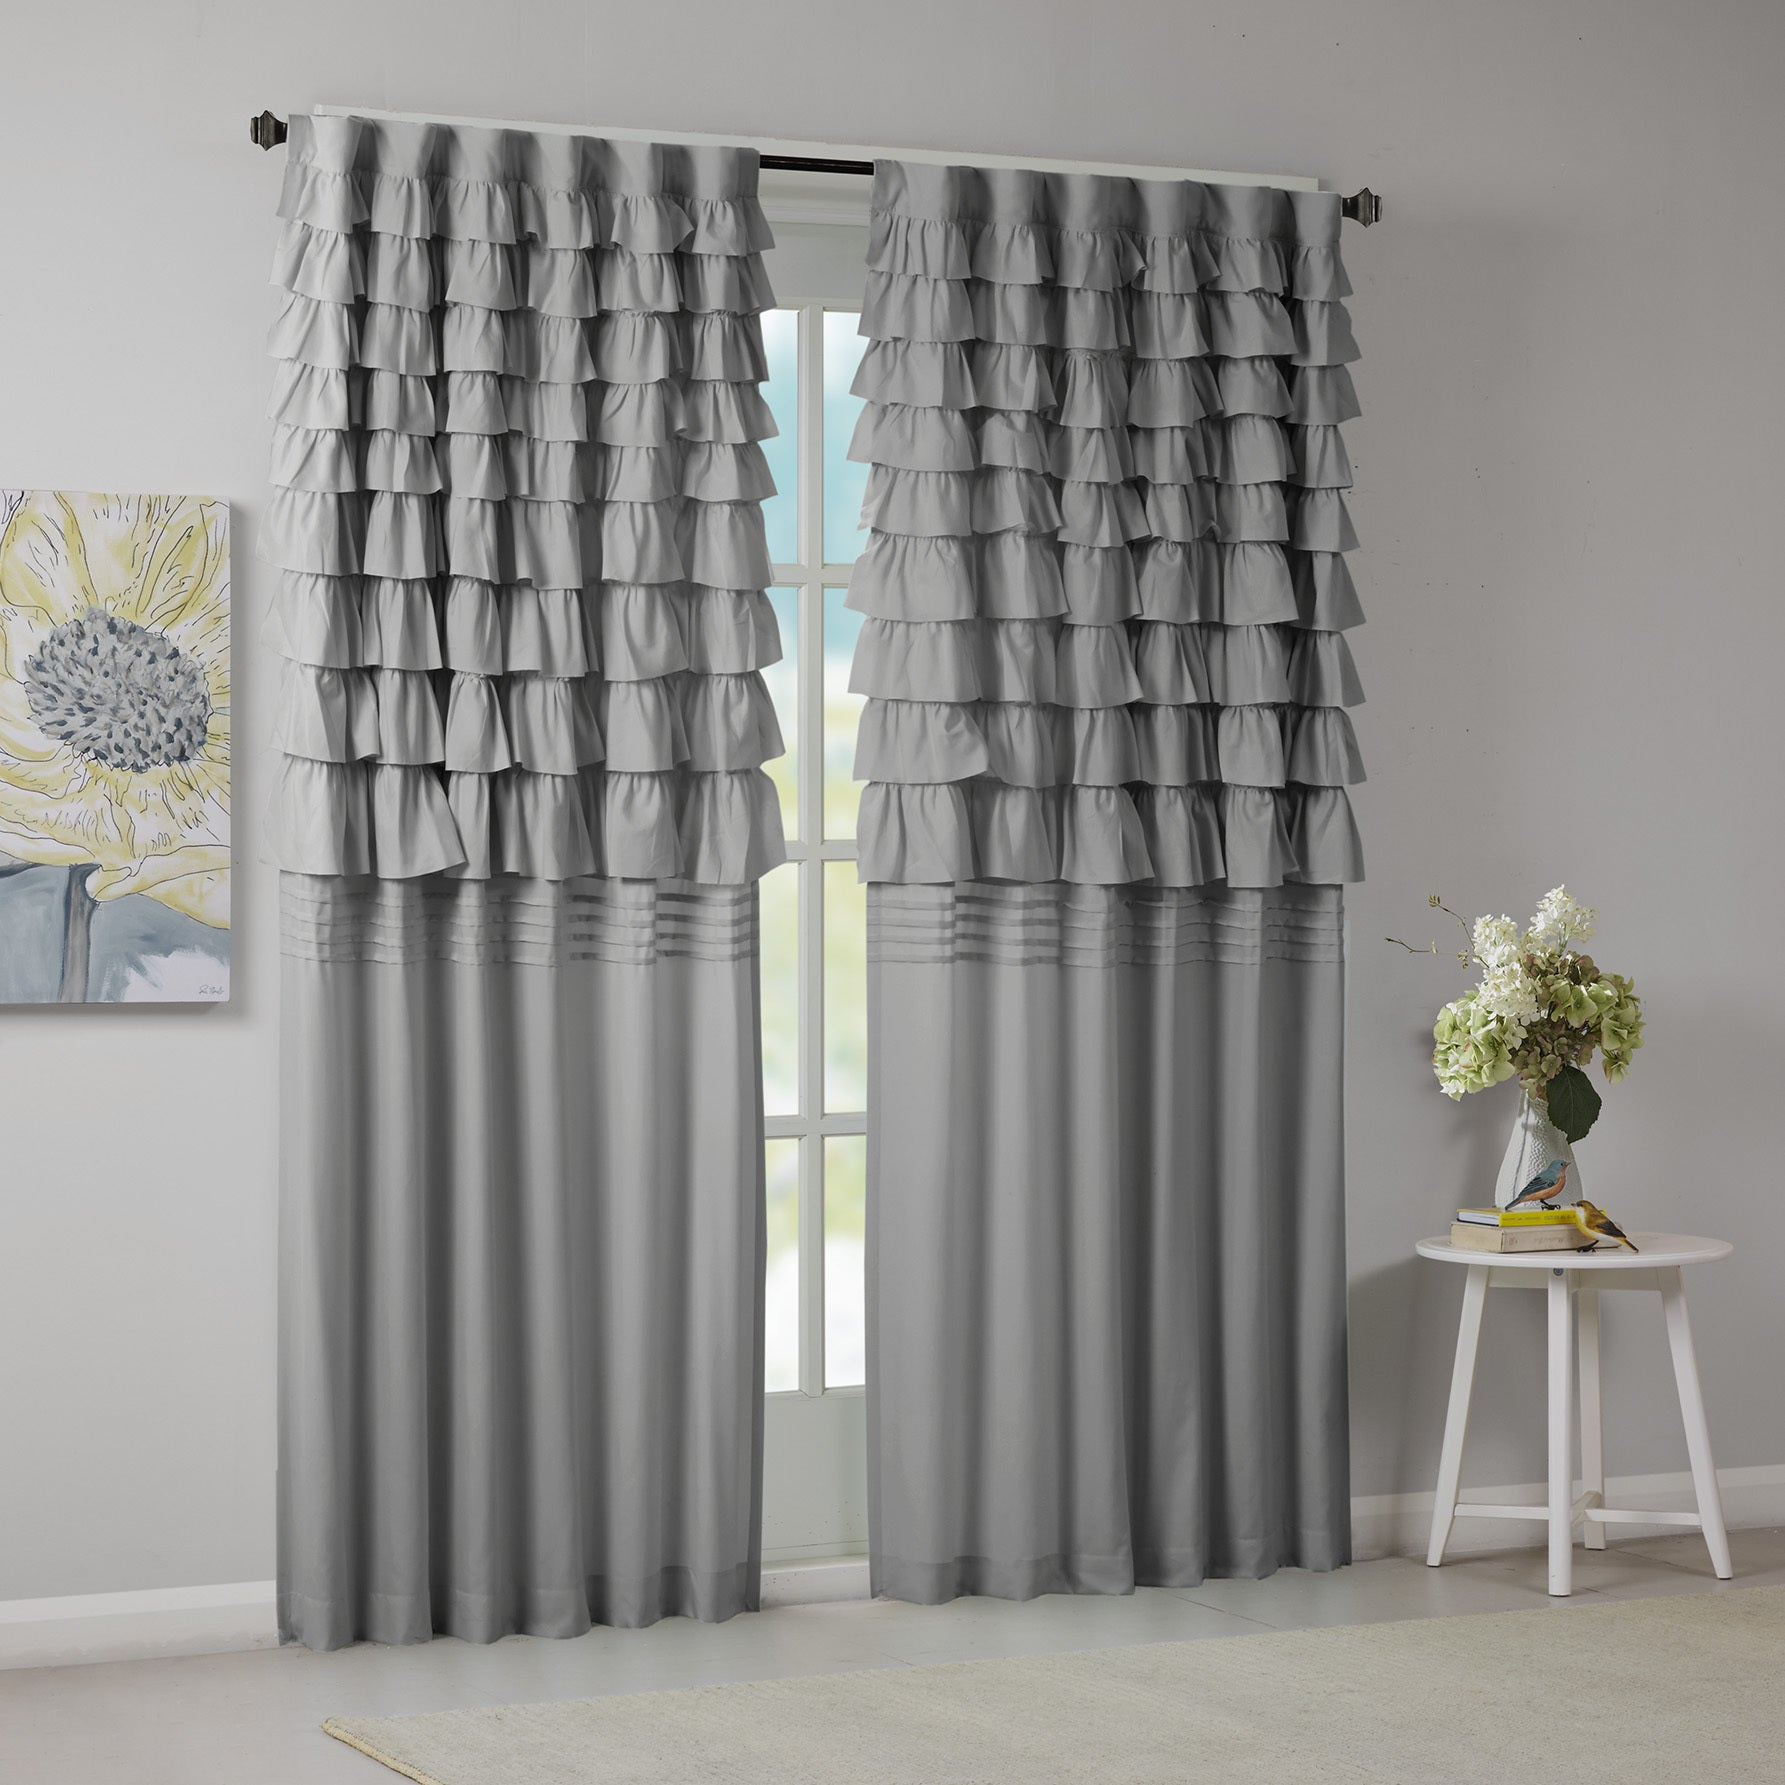 Shop Intelligent Design Delia Grey Ruched Window Curtain